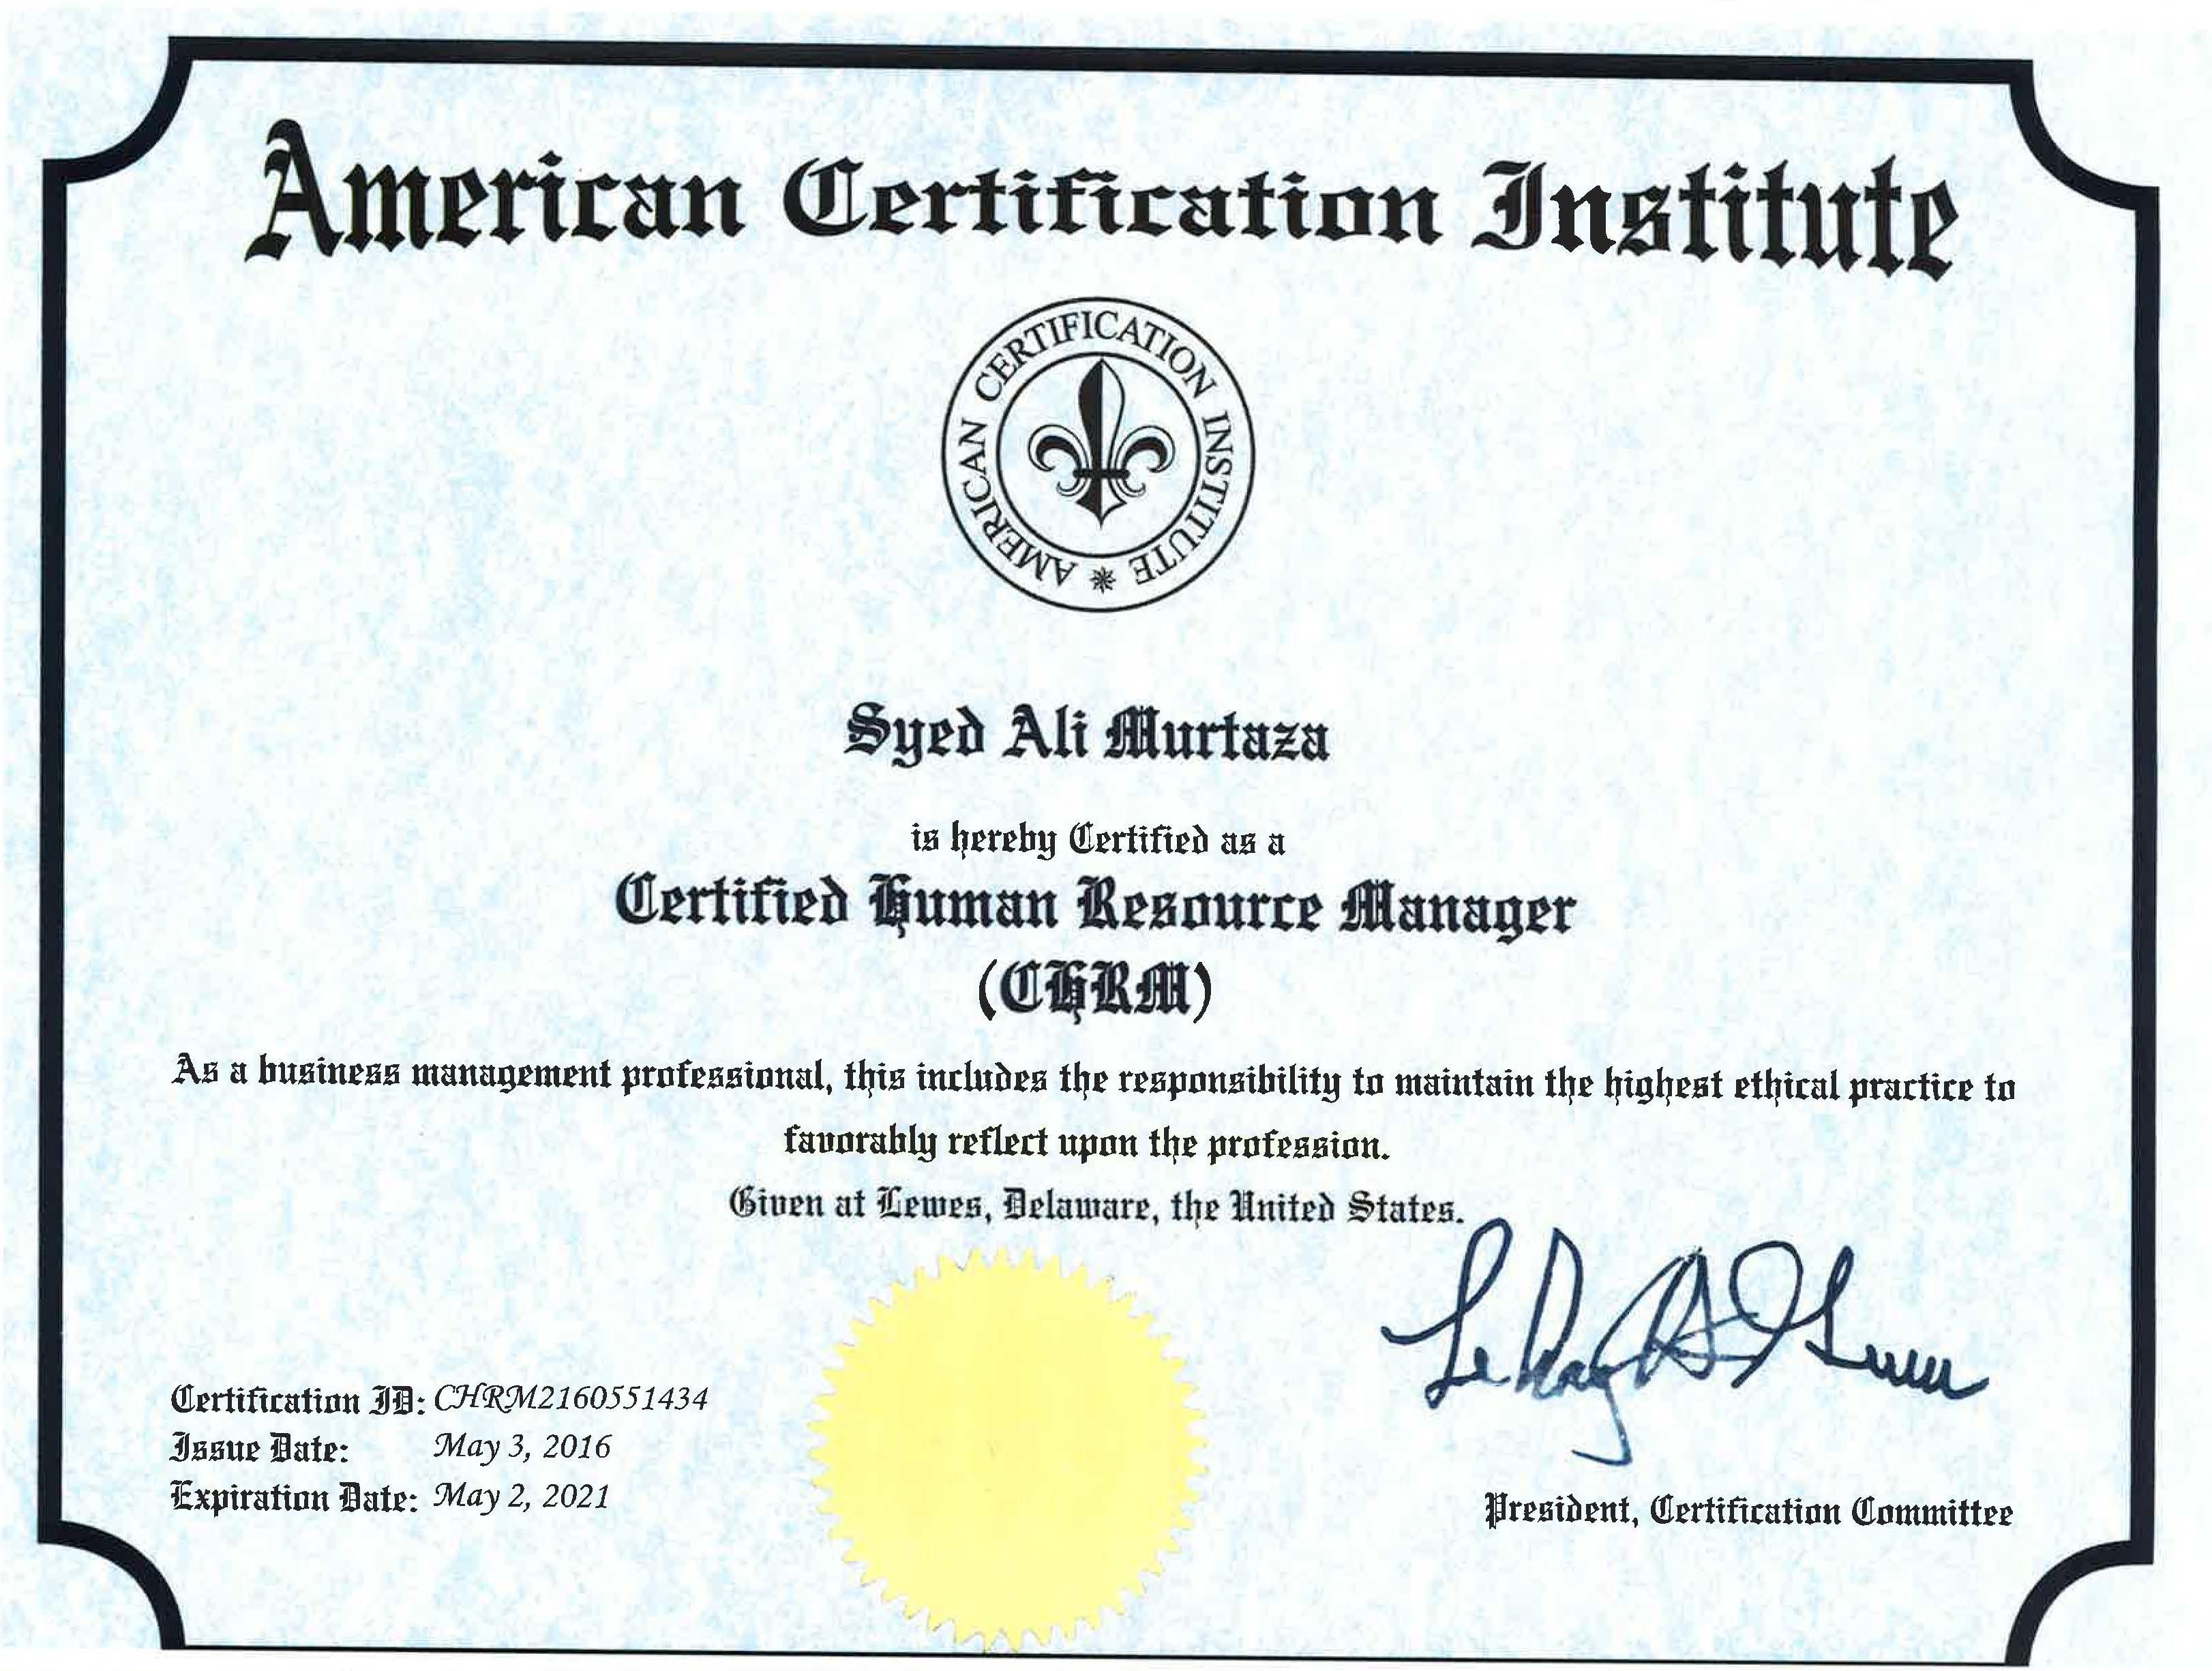 Ali murtaza bayt training institute american certification institute 1betcityfo Gallery